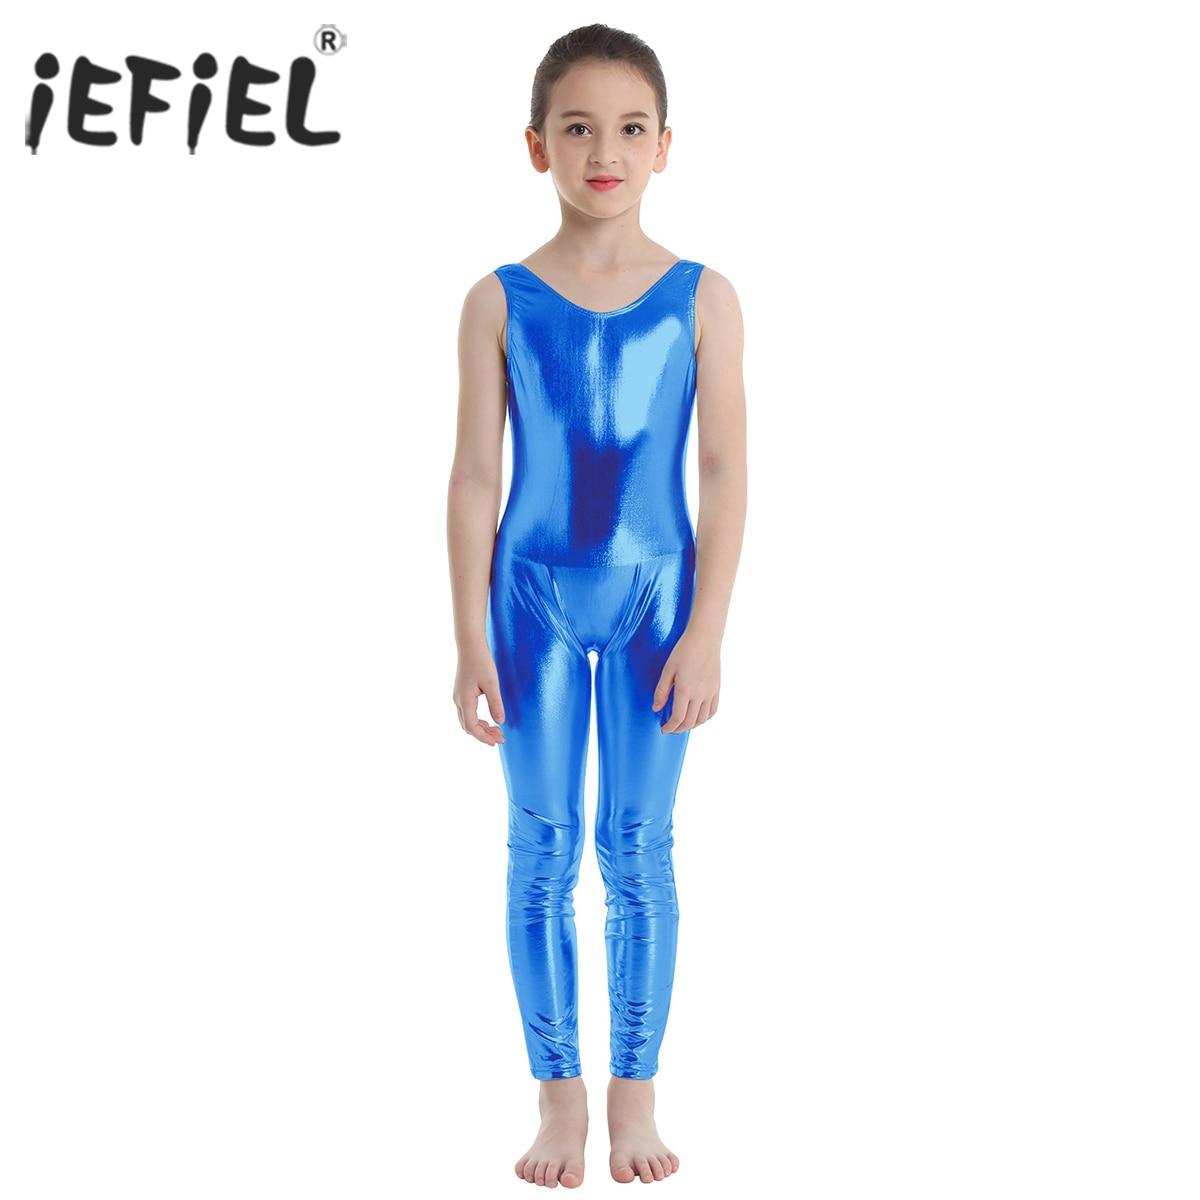 Kid Girl Ballet Dance Leotards Gymnastics Jumpsuits Sports Unitard Shiny Costume